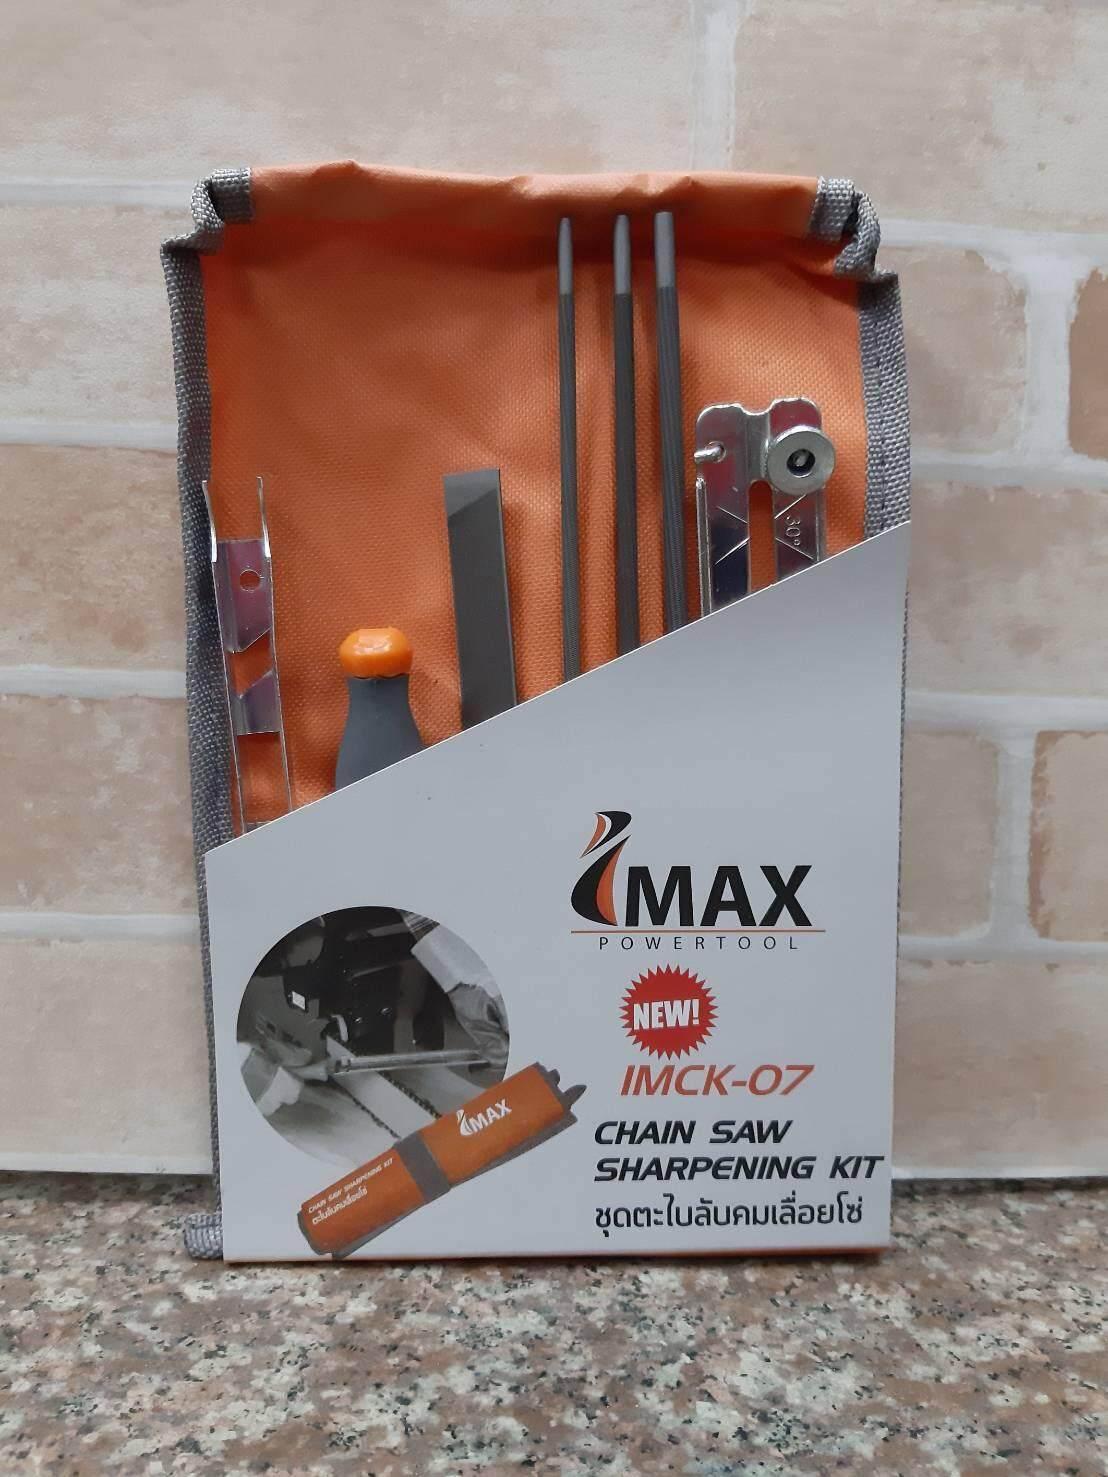 Imax ชุดตะไบลับเลื่อยโซ่ By Ppp Tools.